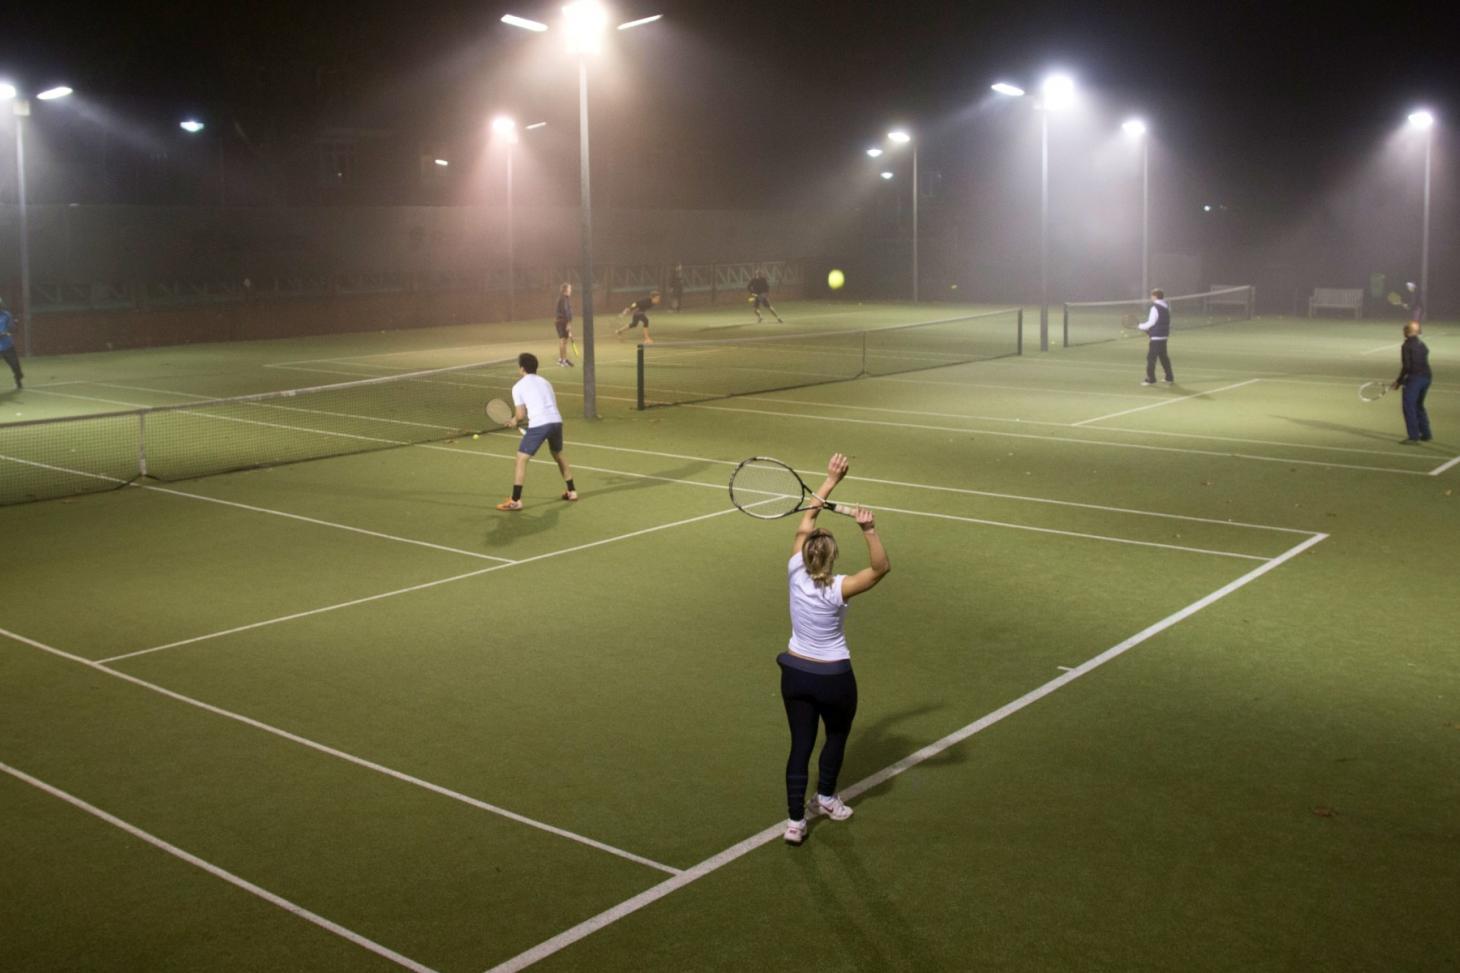 Globe Lawn Tennis Club Outdoor | Astroturf tennis court